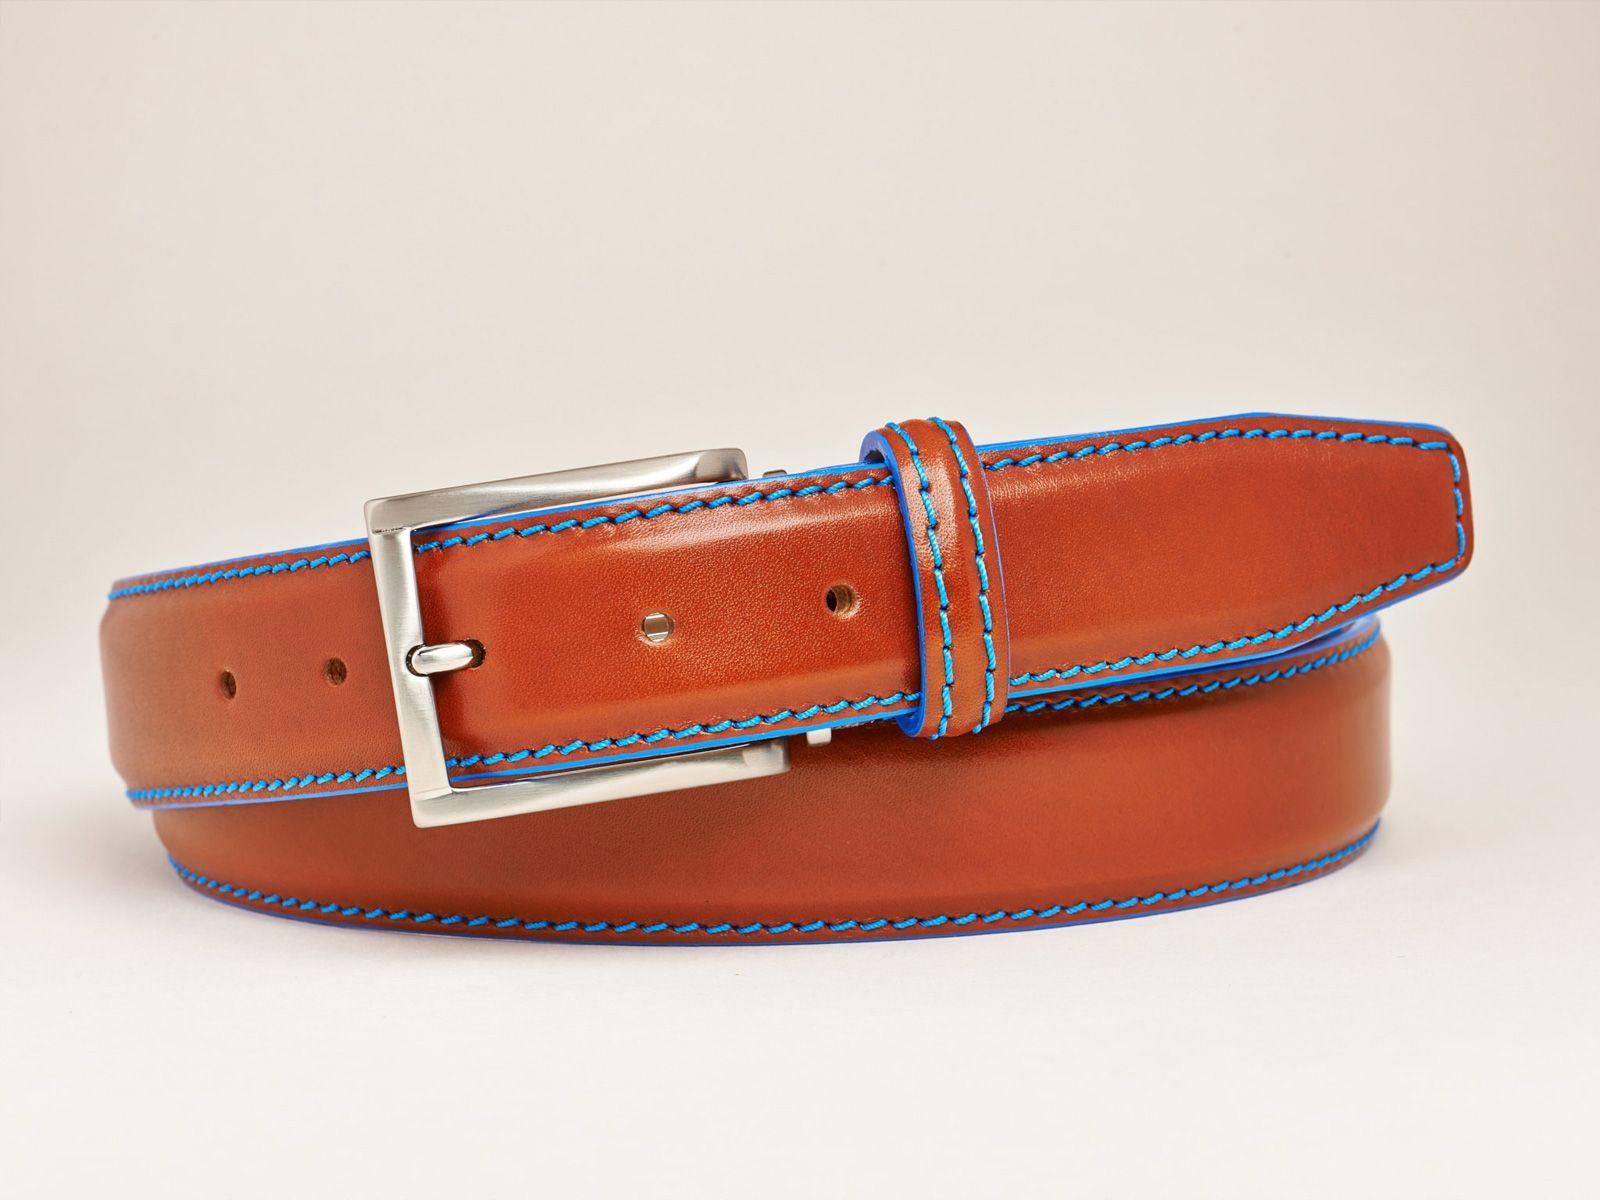 de8c9577771b2 Handgemachter Manufaktur-Ledergürtel von Roger Ximenez    Handmade Leather  Belt by Roger Ximenez